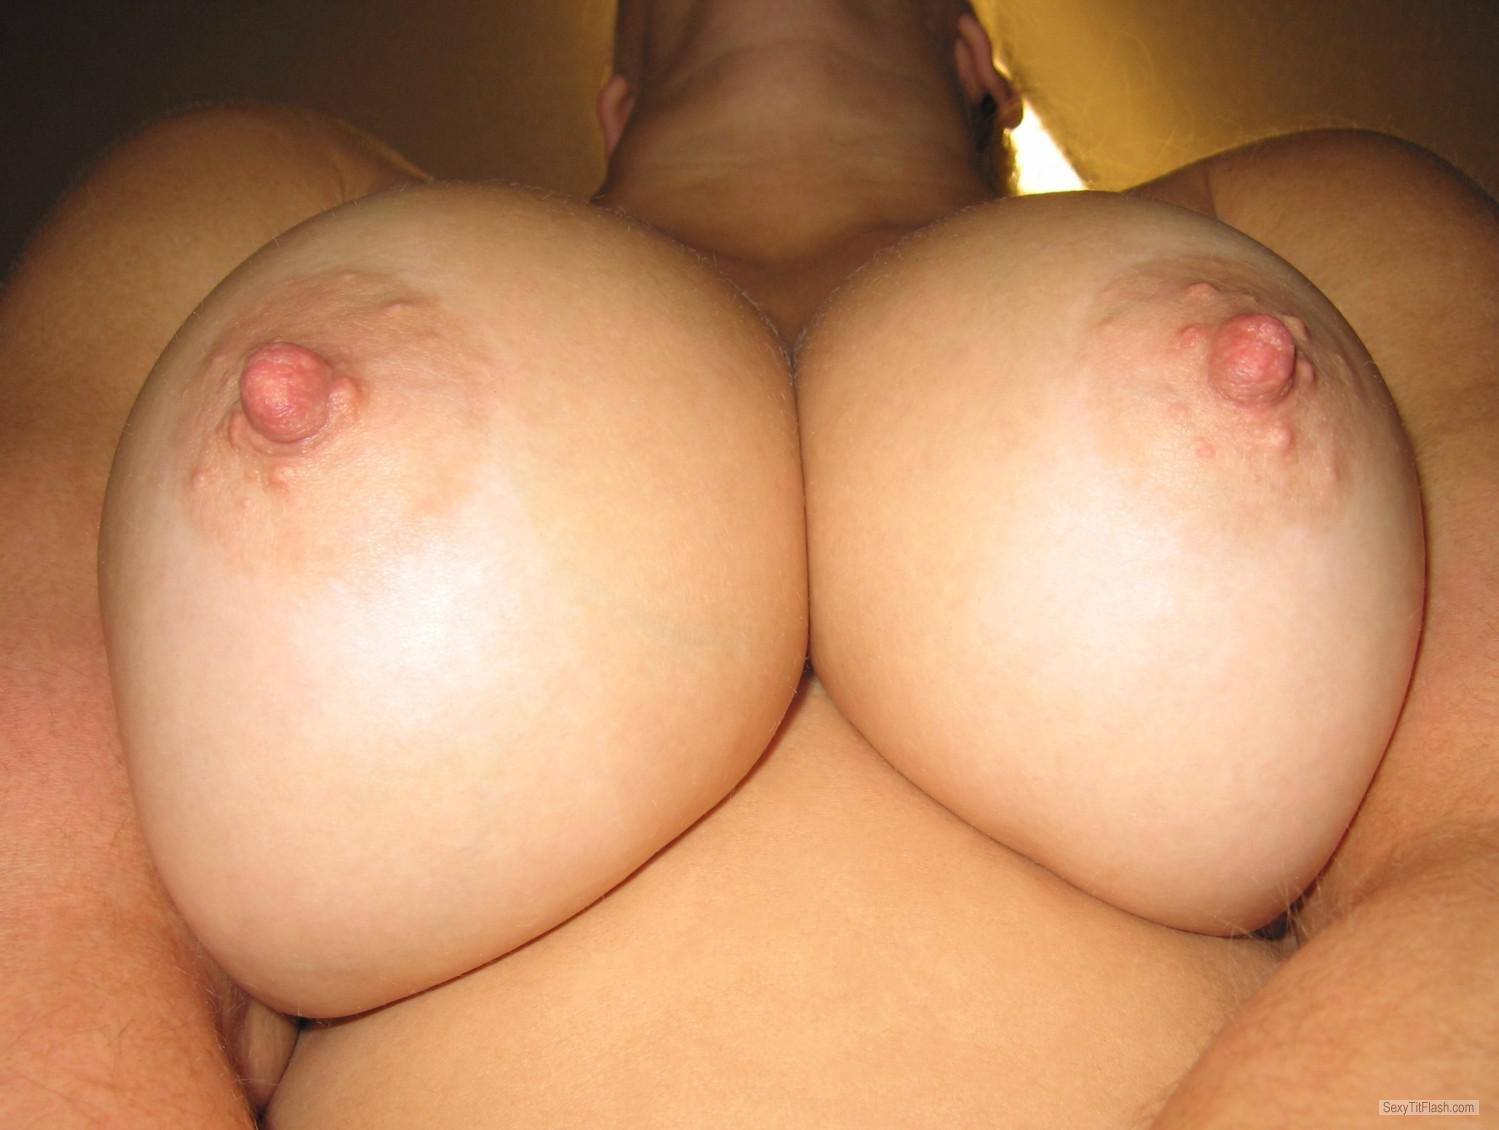 My big boobs in white t shirt tank top see thru nipples 2